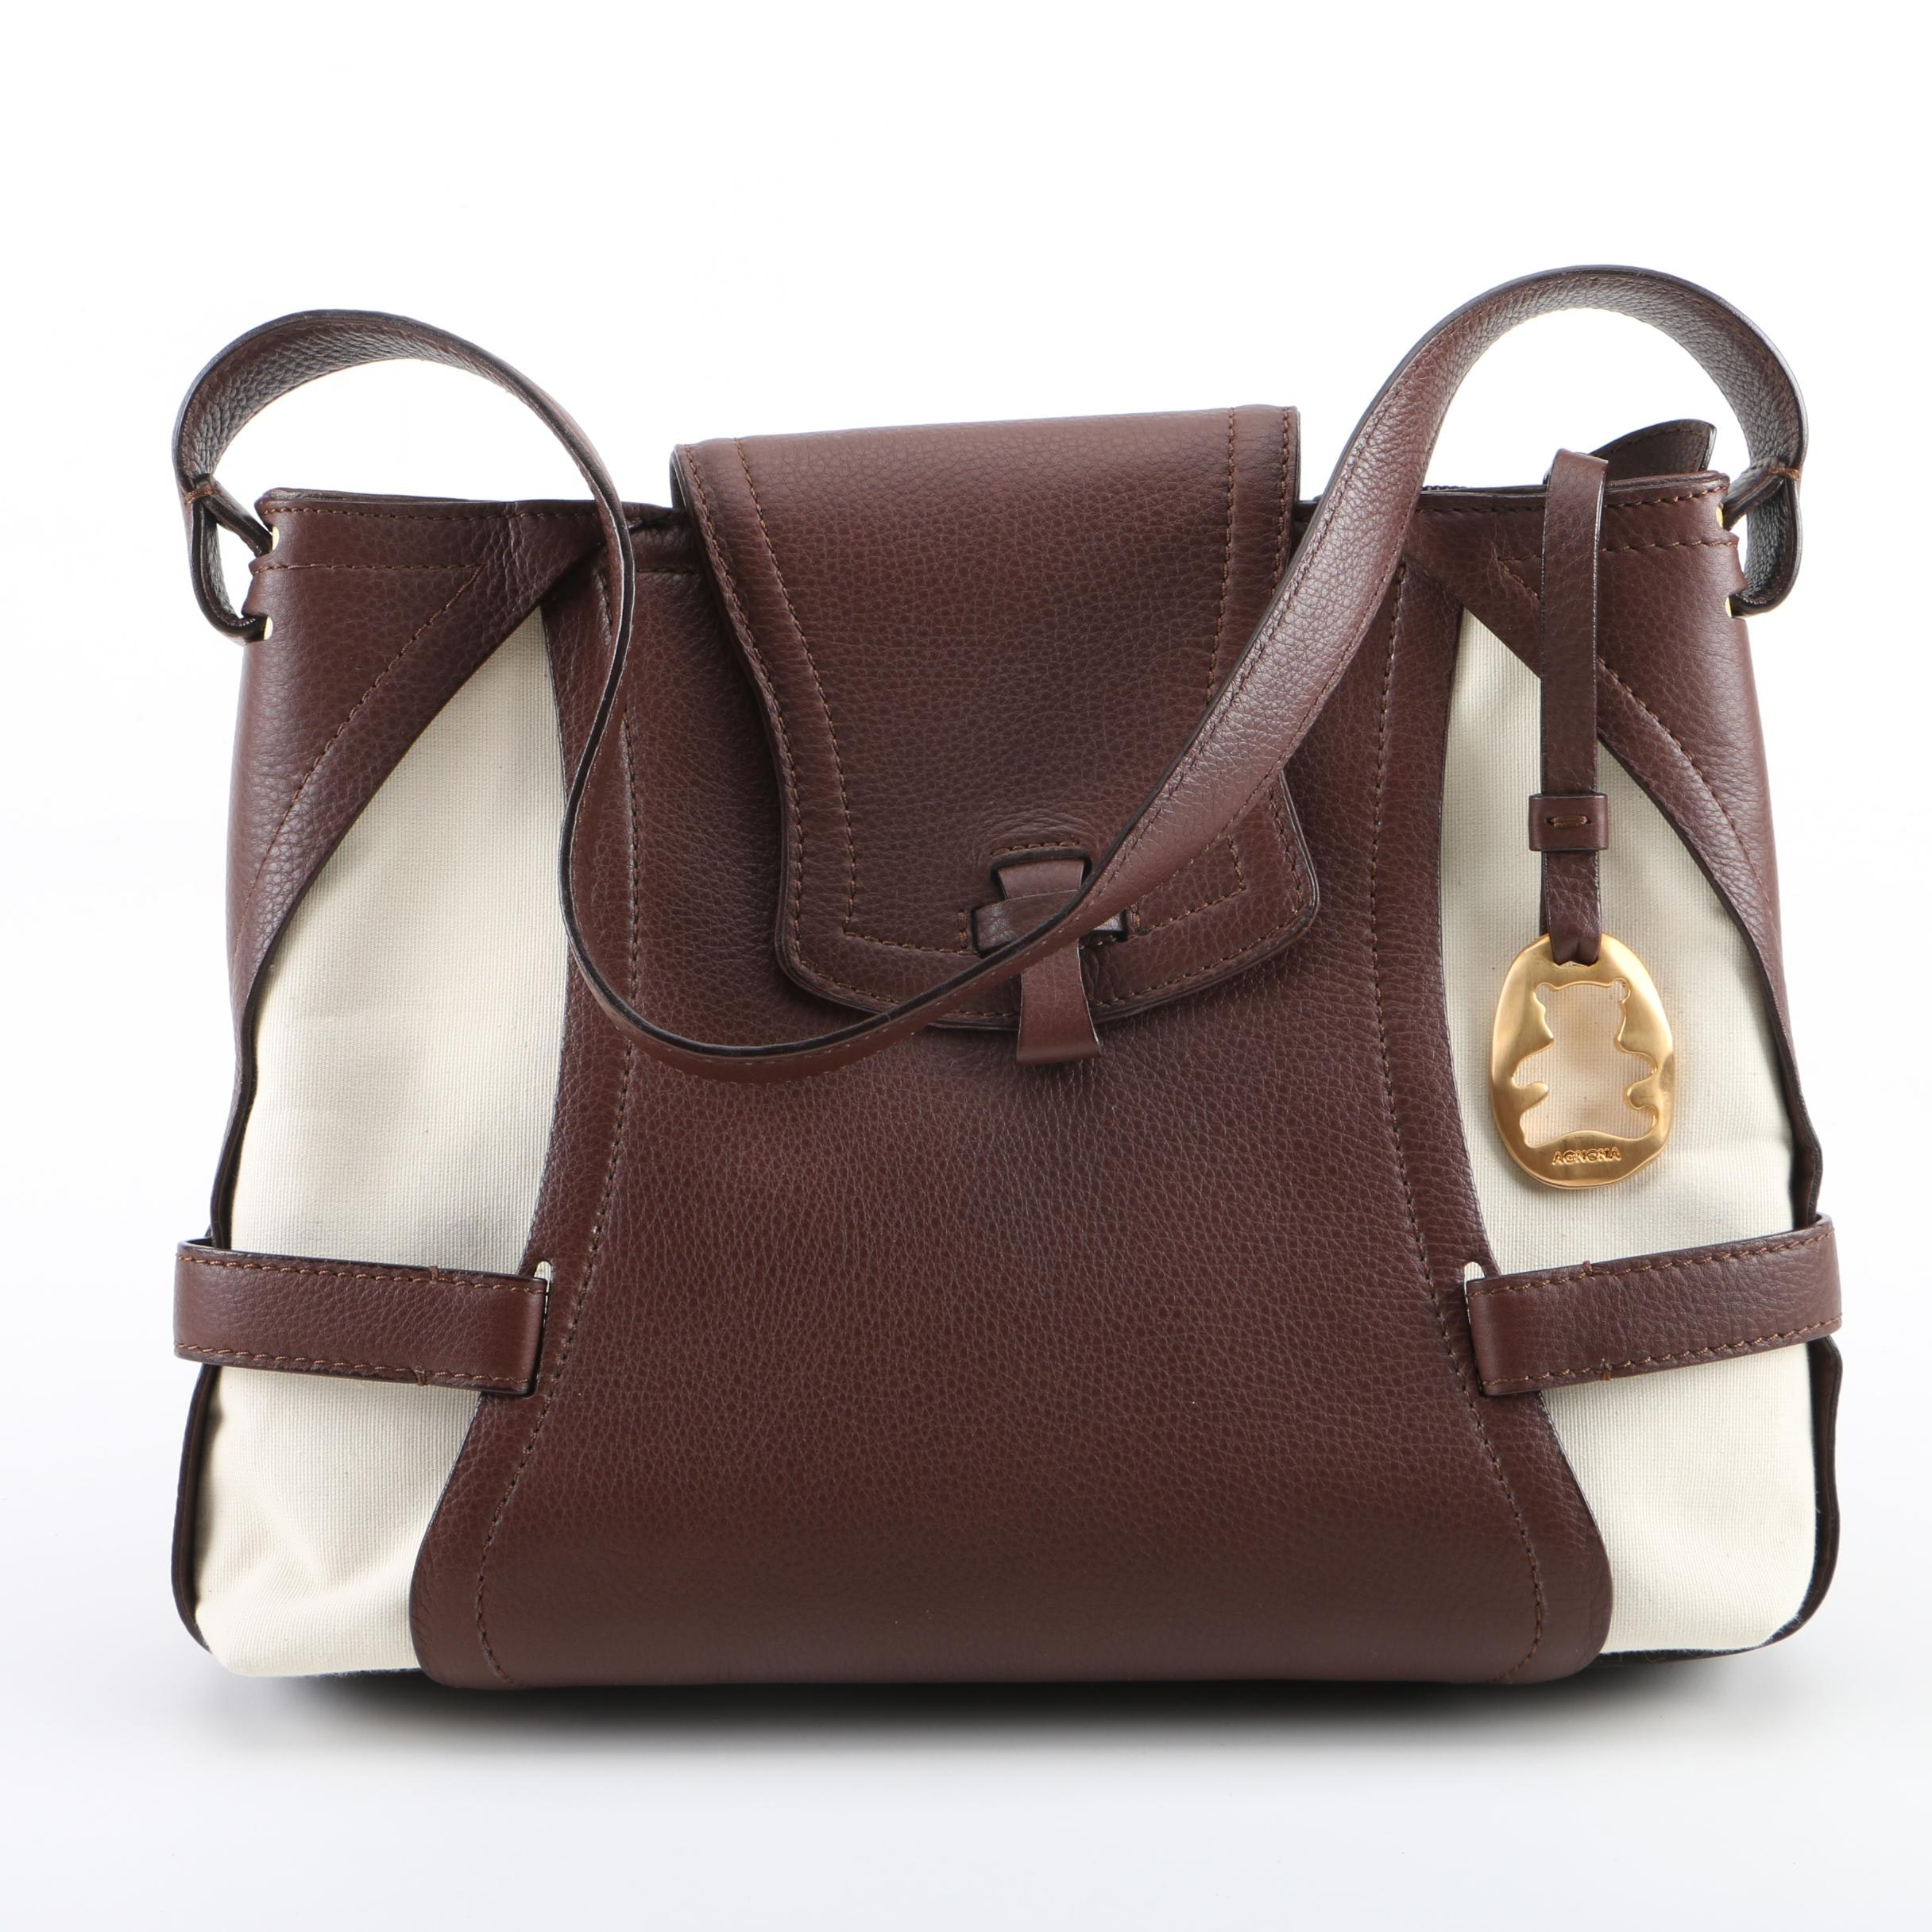 Agnona Off-White Canvas and Brown Leather Handbag